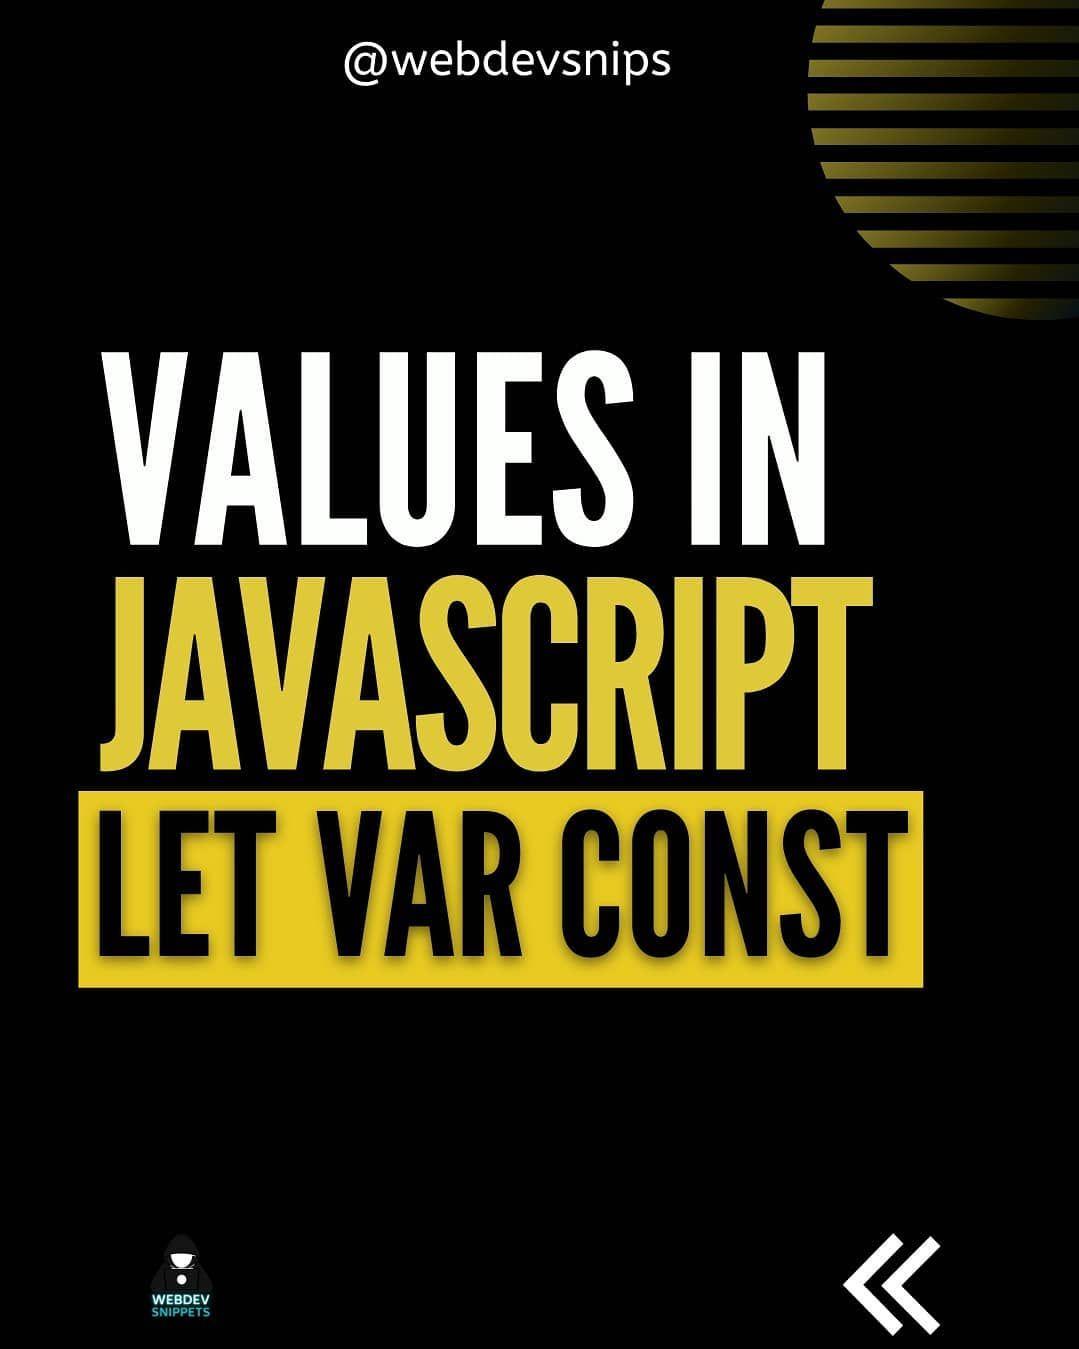 Values in javascript let var const